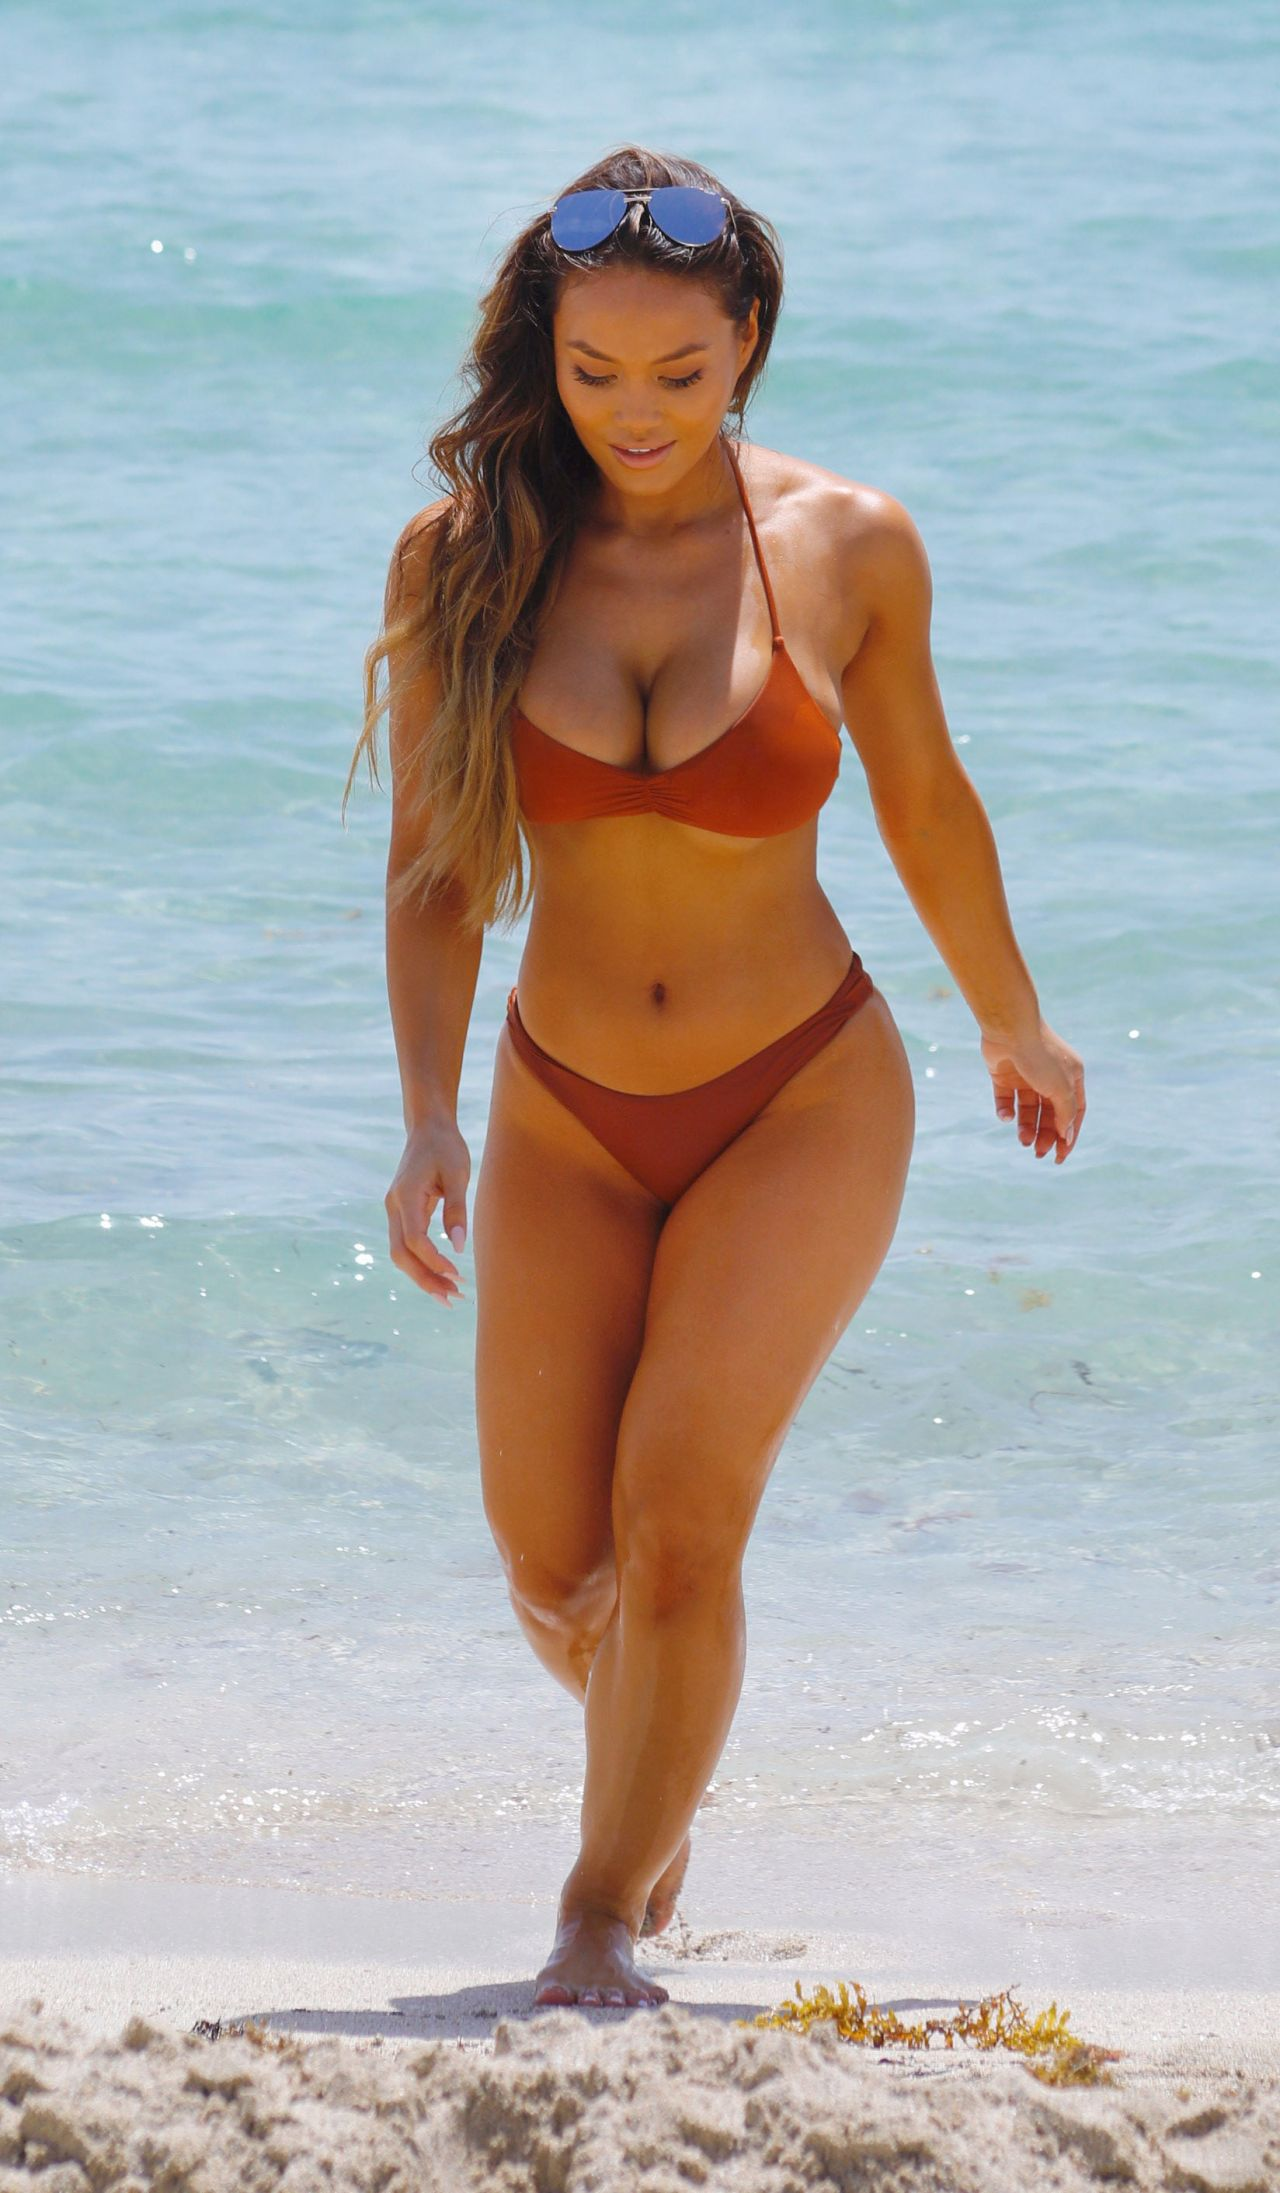 Daphne Joy In A Teeny Bikini On Miami Beach 07242017-1615